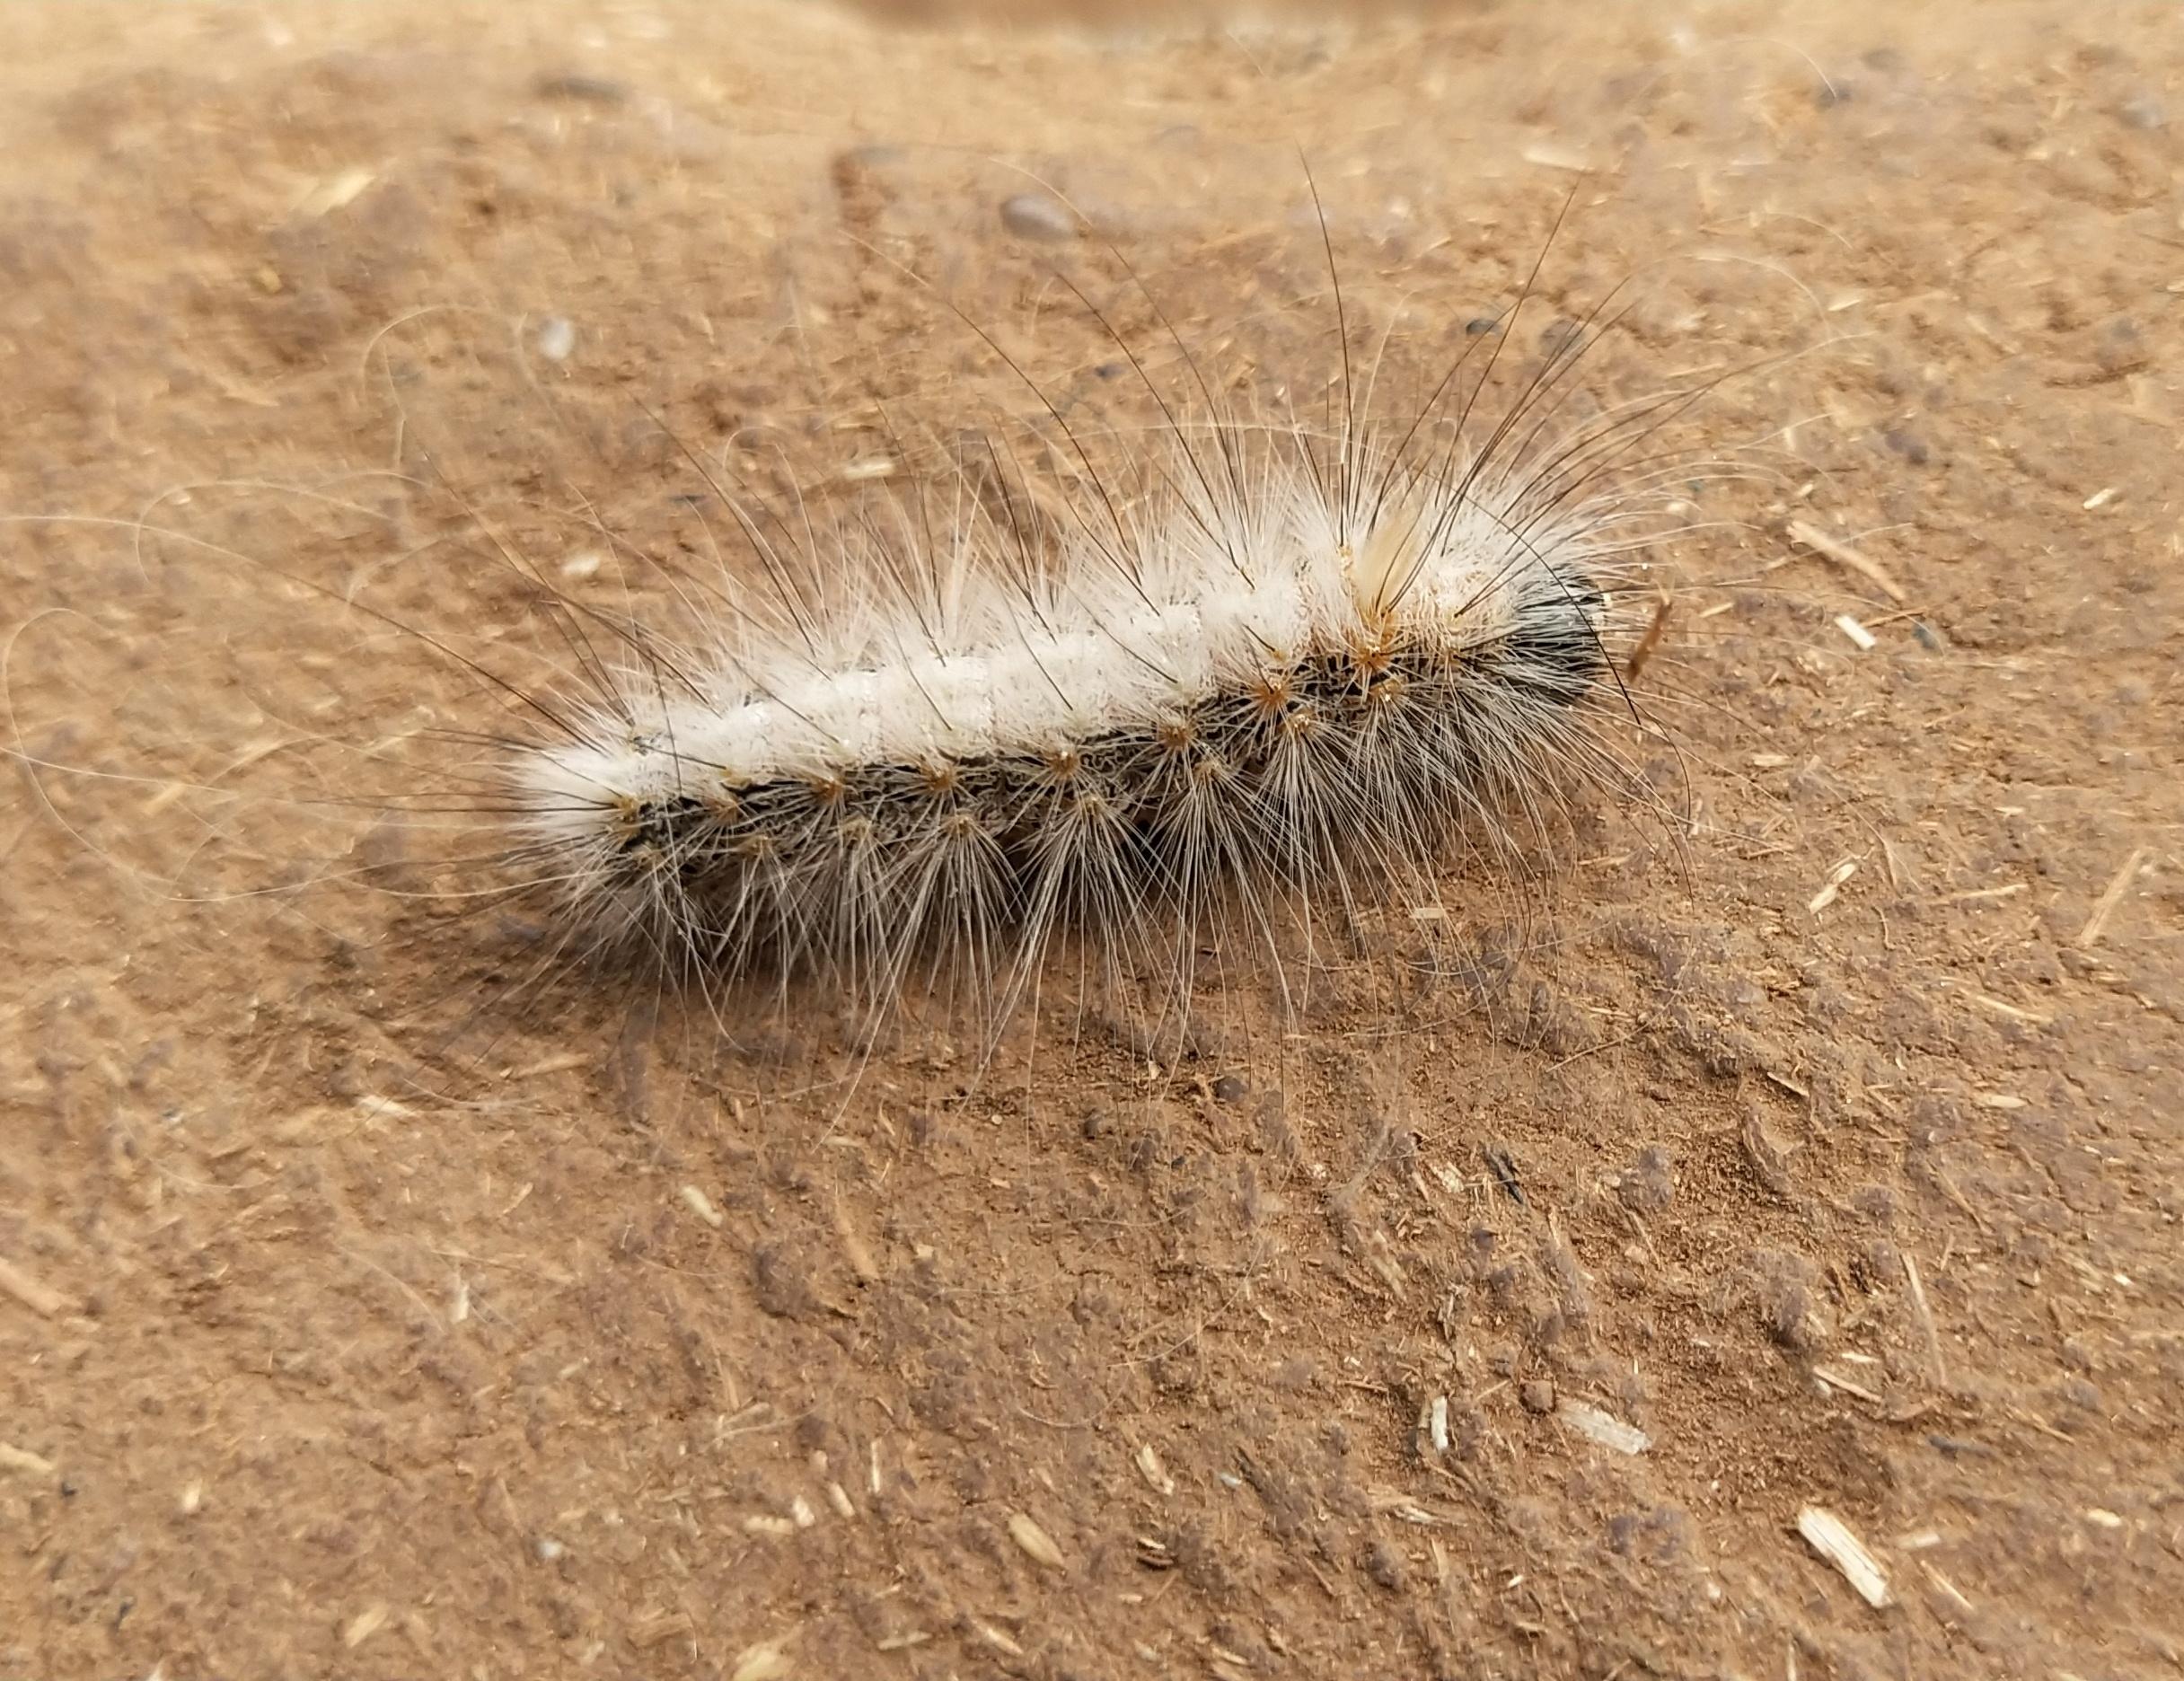 A thorny caterpillar